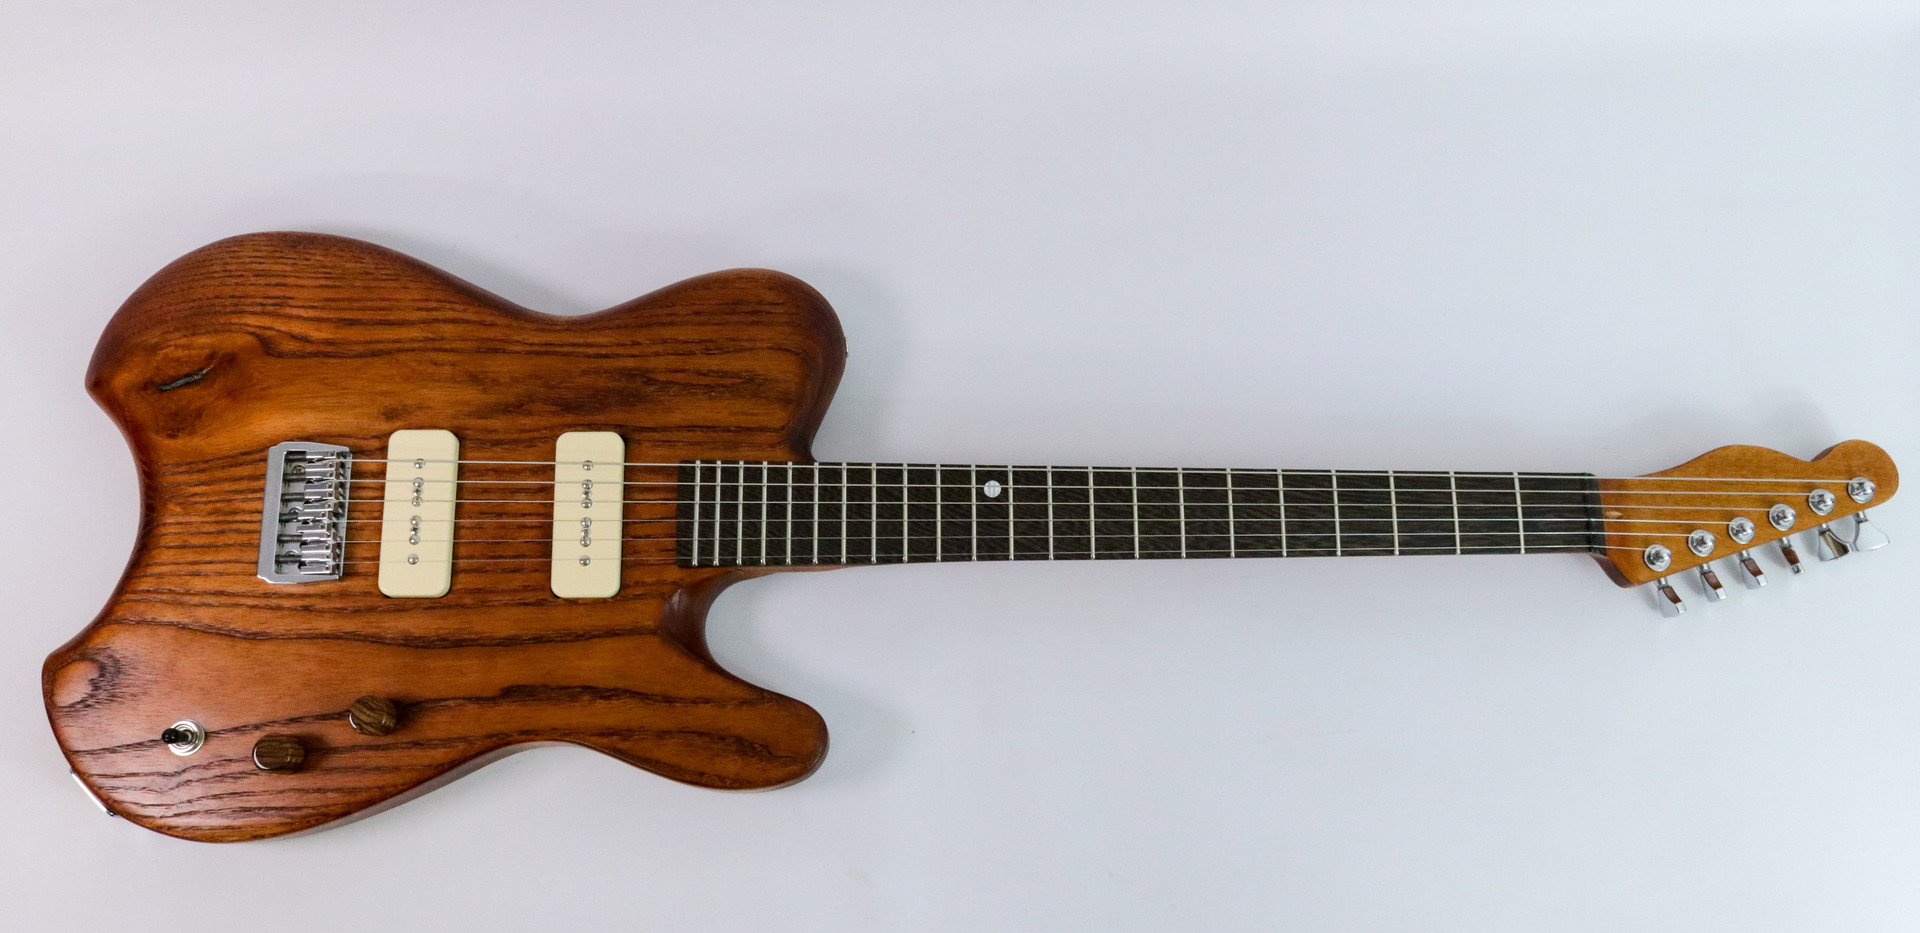 Gavin Hallam Guitar 1 (1 of 23).jpg